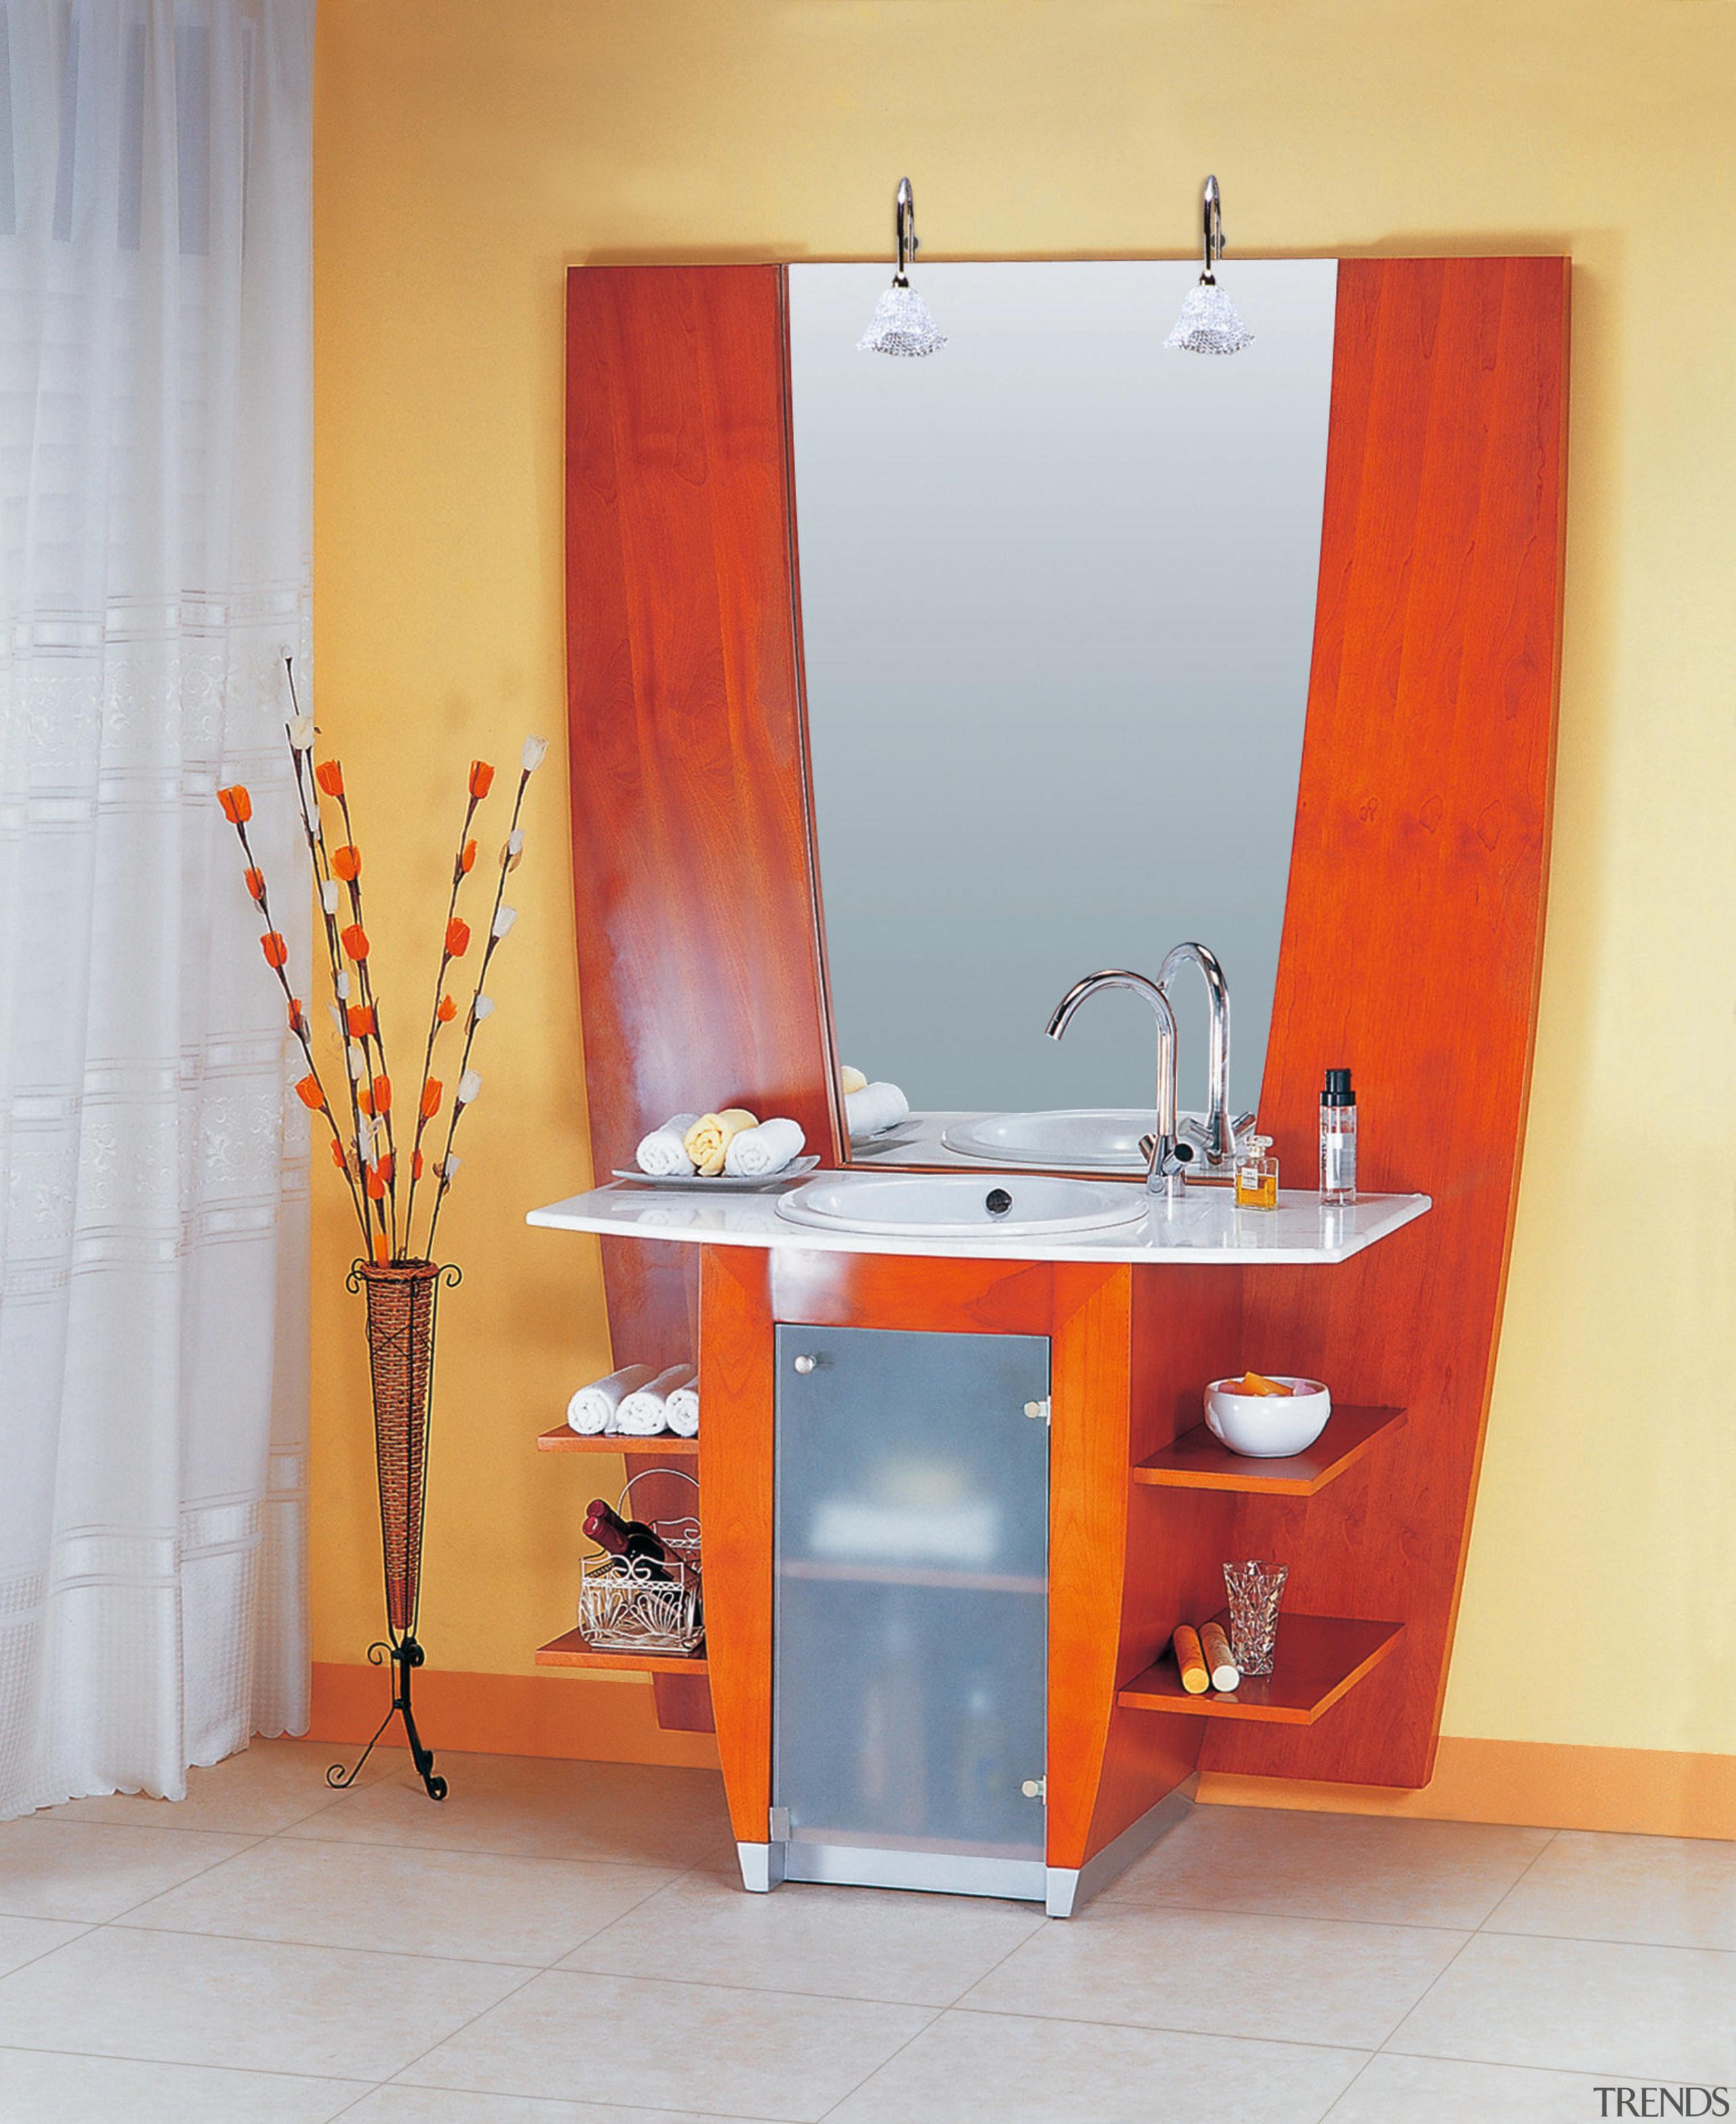 Elleti Kitchens European  inspired vanity designs utilize bathroom, bathroom accessory, bathroom cabinet, furniture, interior design, orange, plumbing fixture, room, sink, table, gray, orange